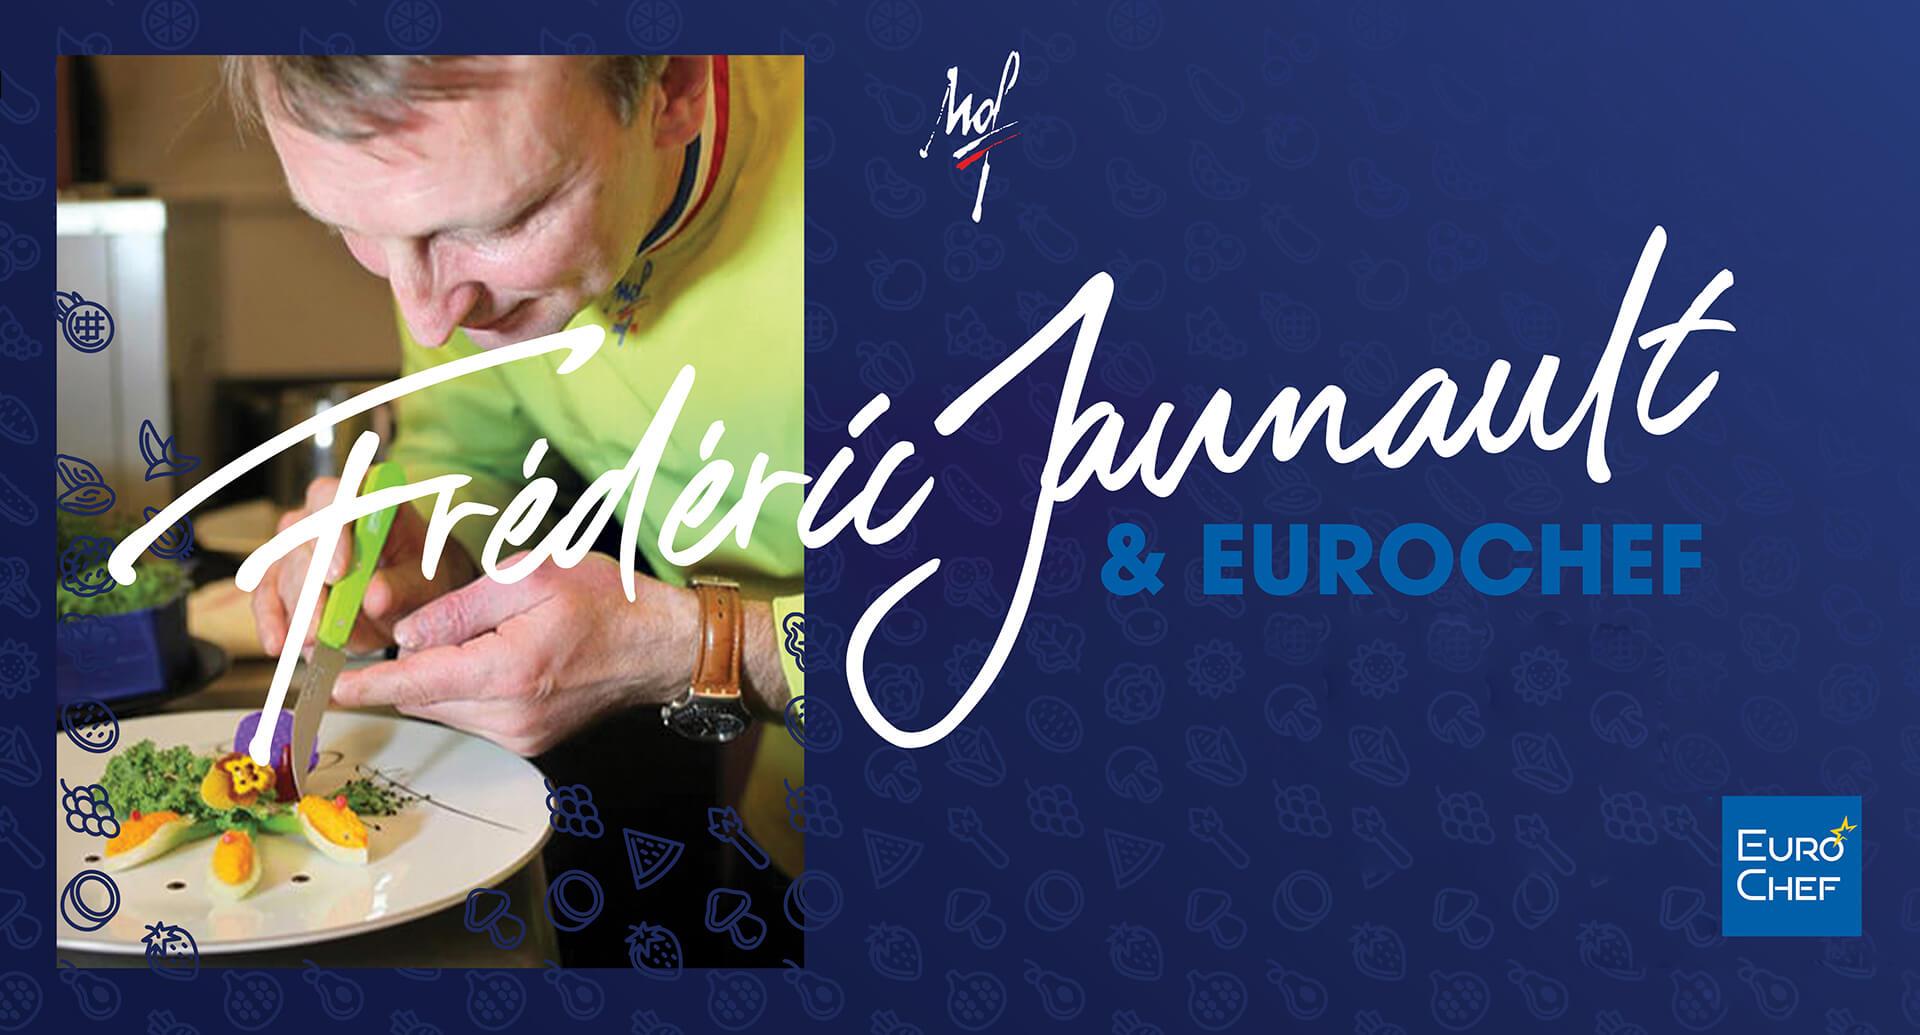 Visuel EuroChef - Frédéric Jaunault